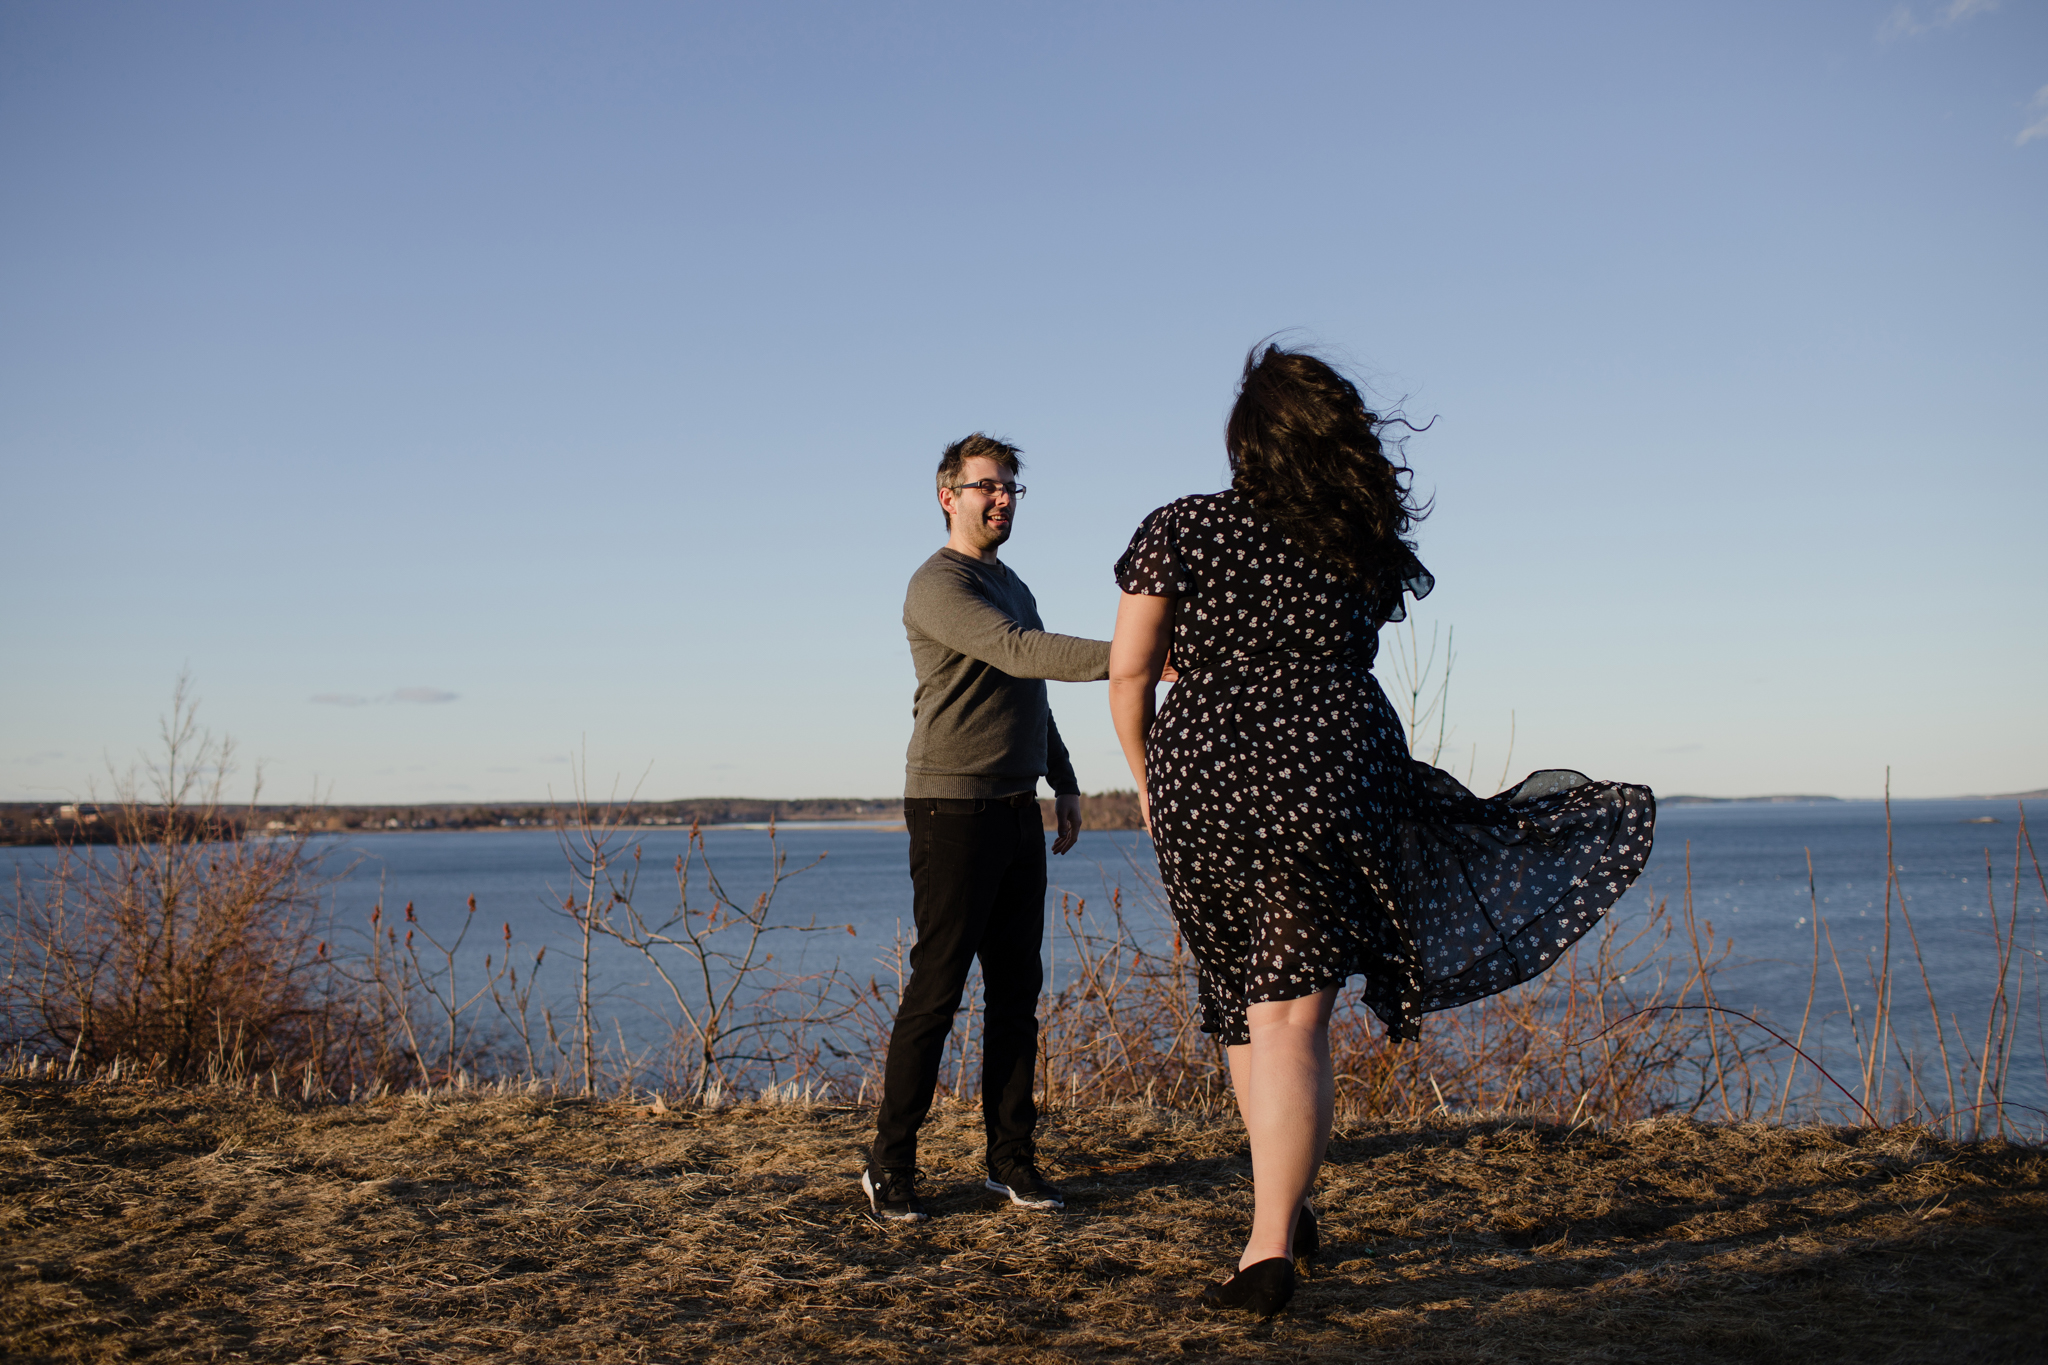 maine-wedding-photographer-engagement-session  -48.jpg